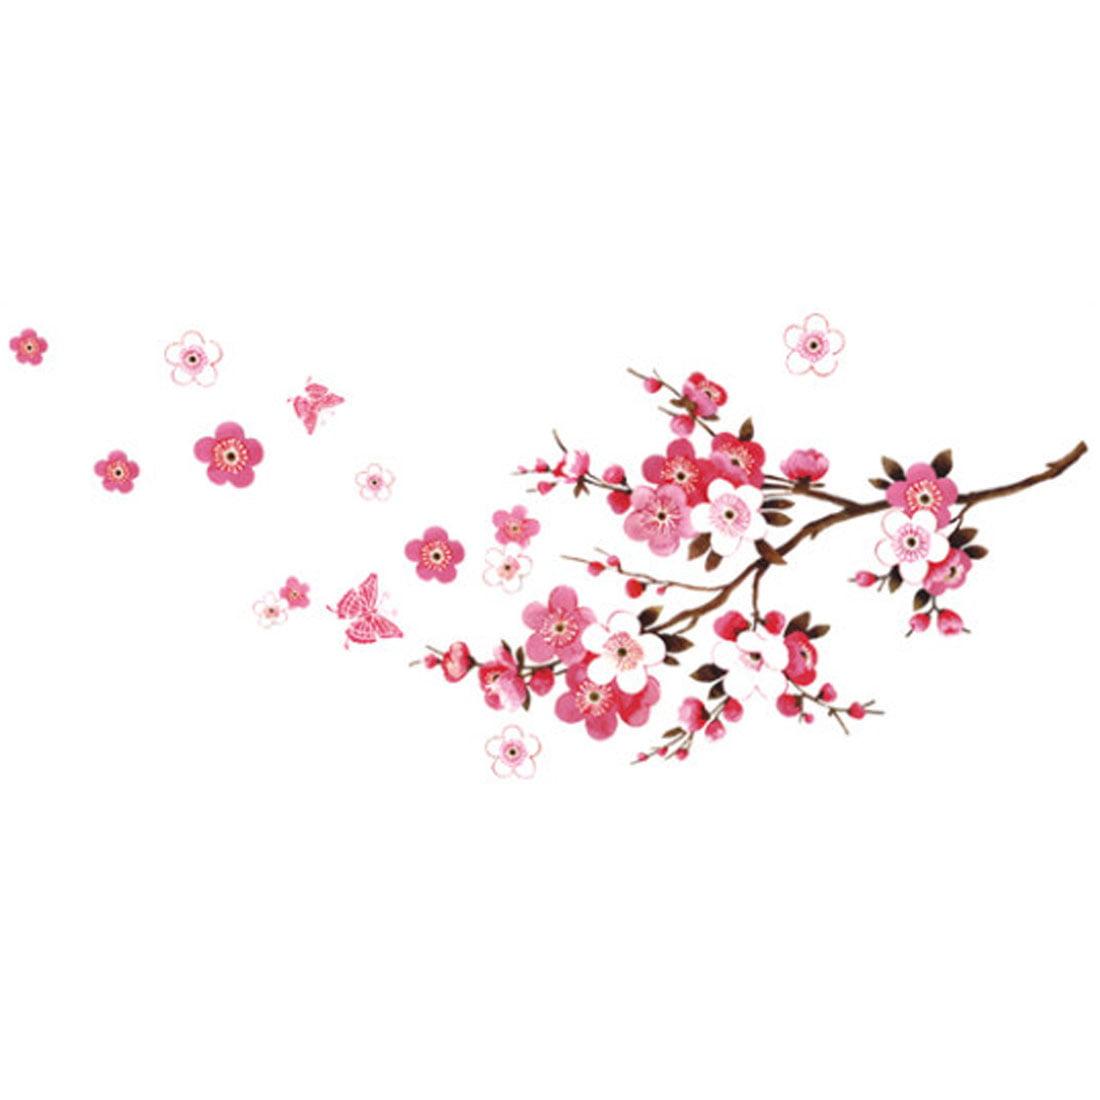 Bedroom Decor Plum Flower Pattern Self Adhesive Wall Decor Sticker Wallpaper Decal